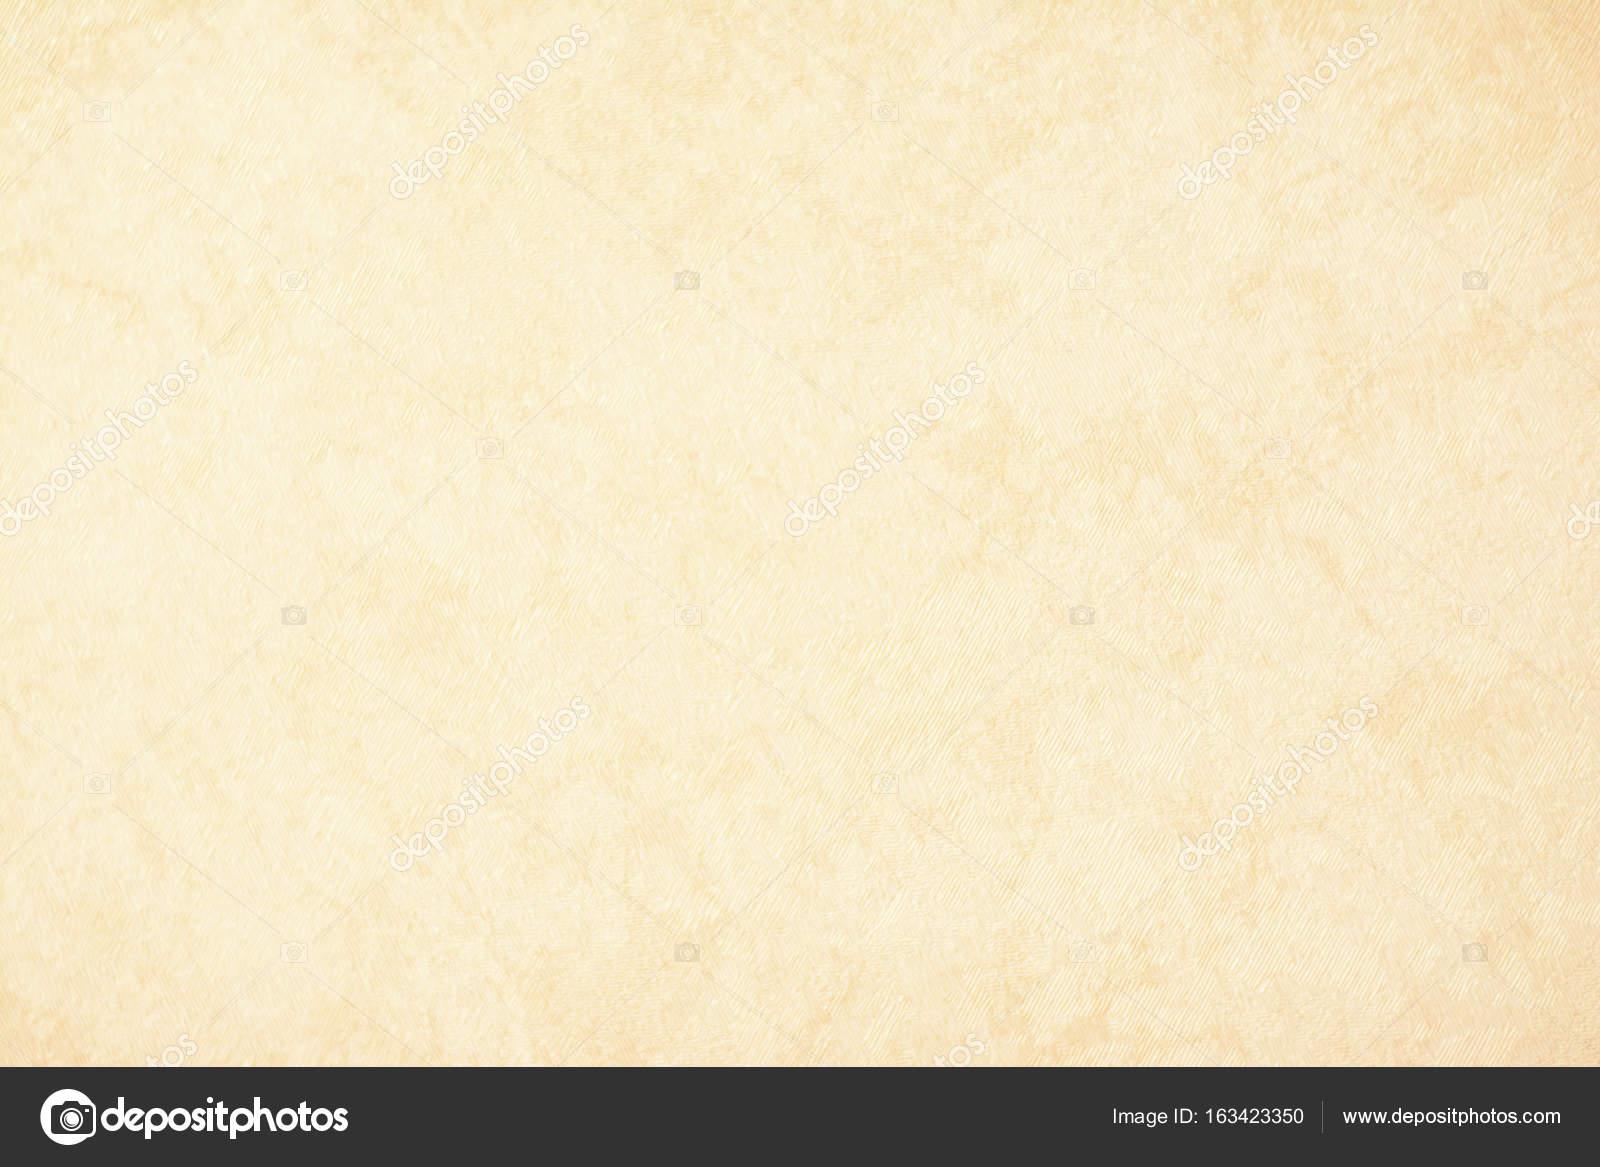 ab5feb4d6789 Documento de antecedentes de oro textura en color crema o beige vintage  amarillo